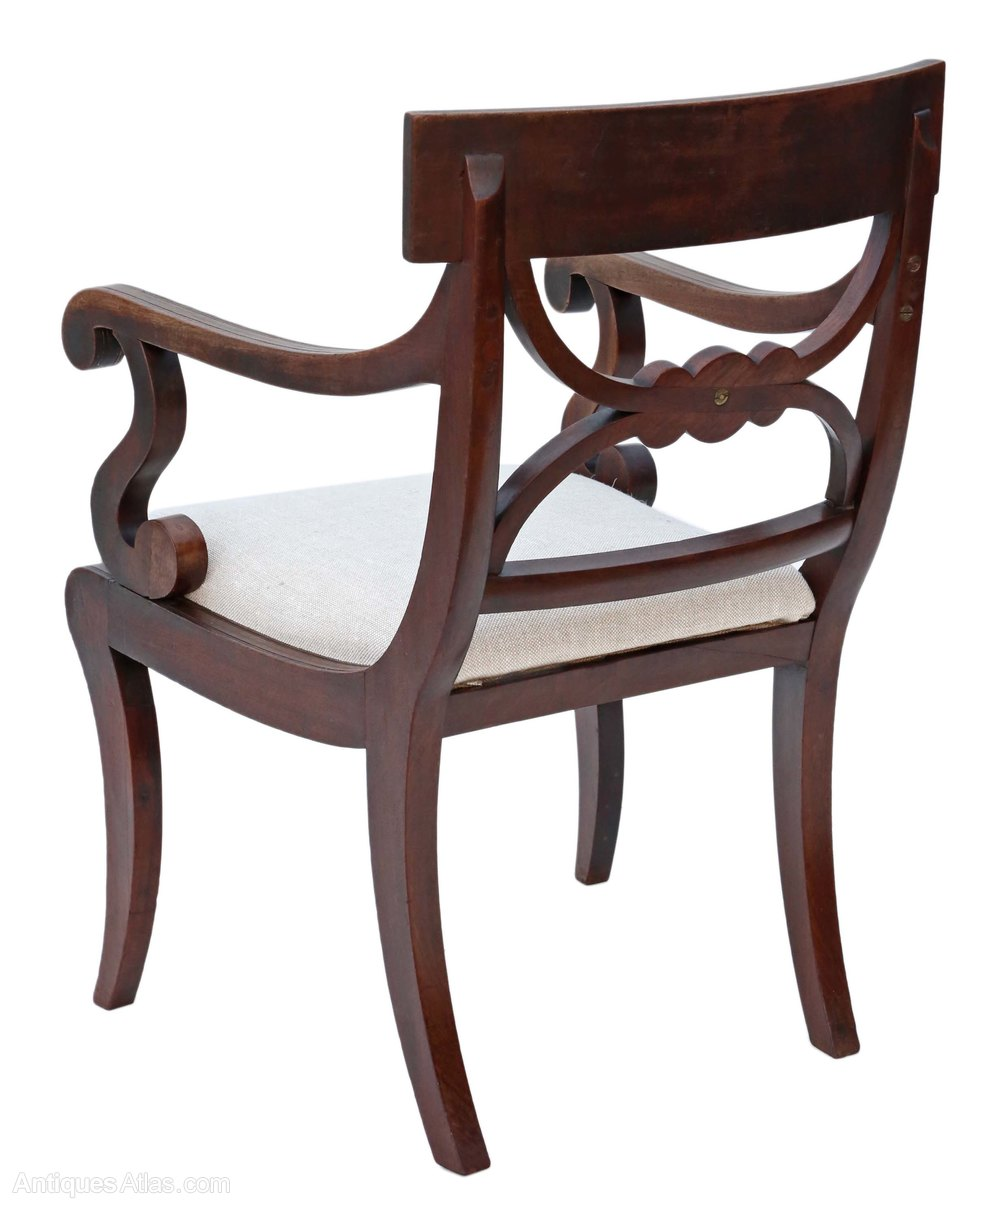 Regency C1825 Mahogany Elbow Desk Carver Chair Antiques